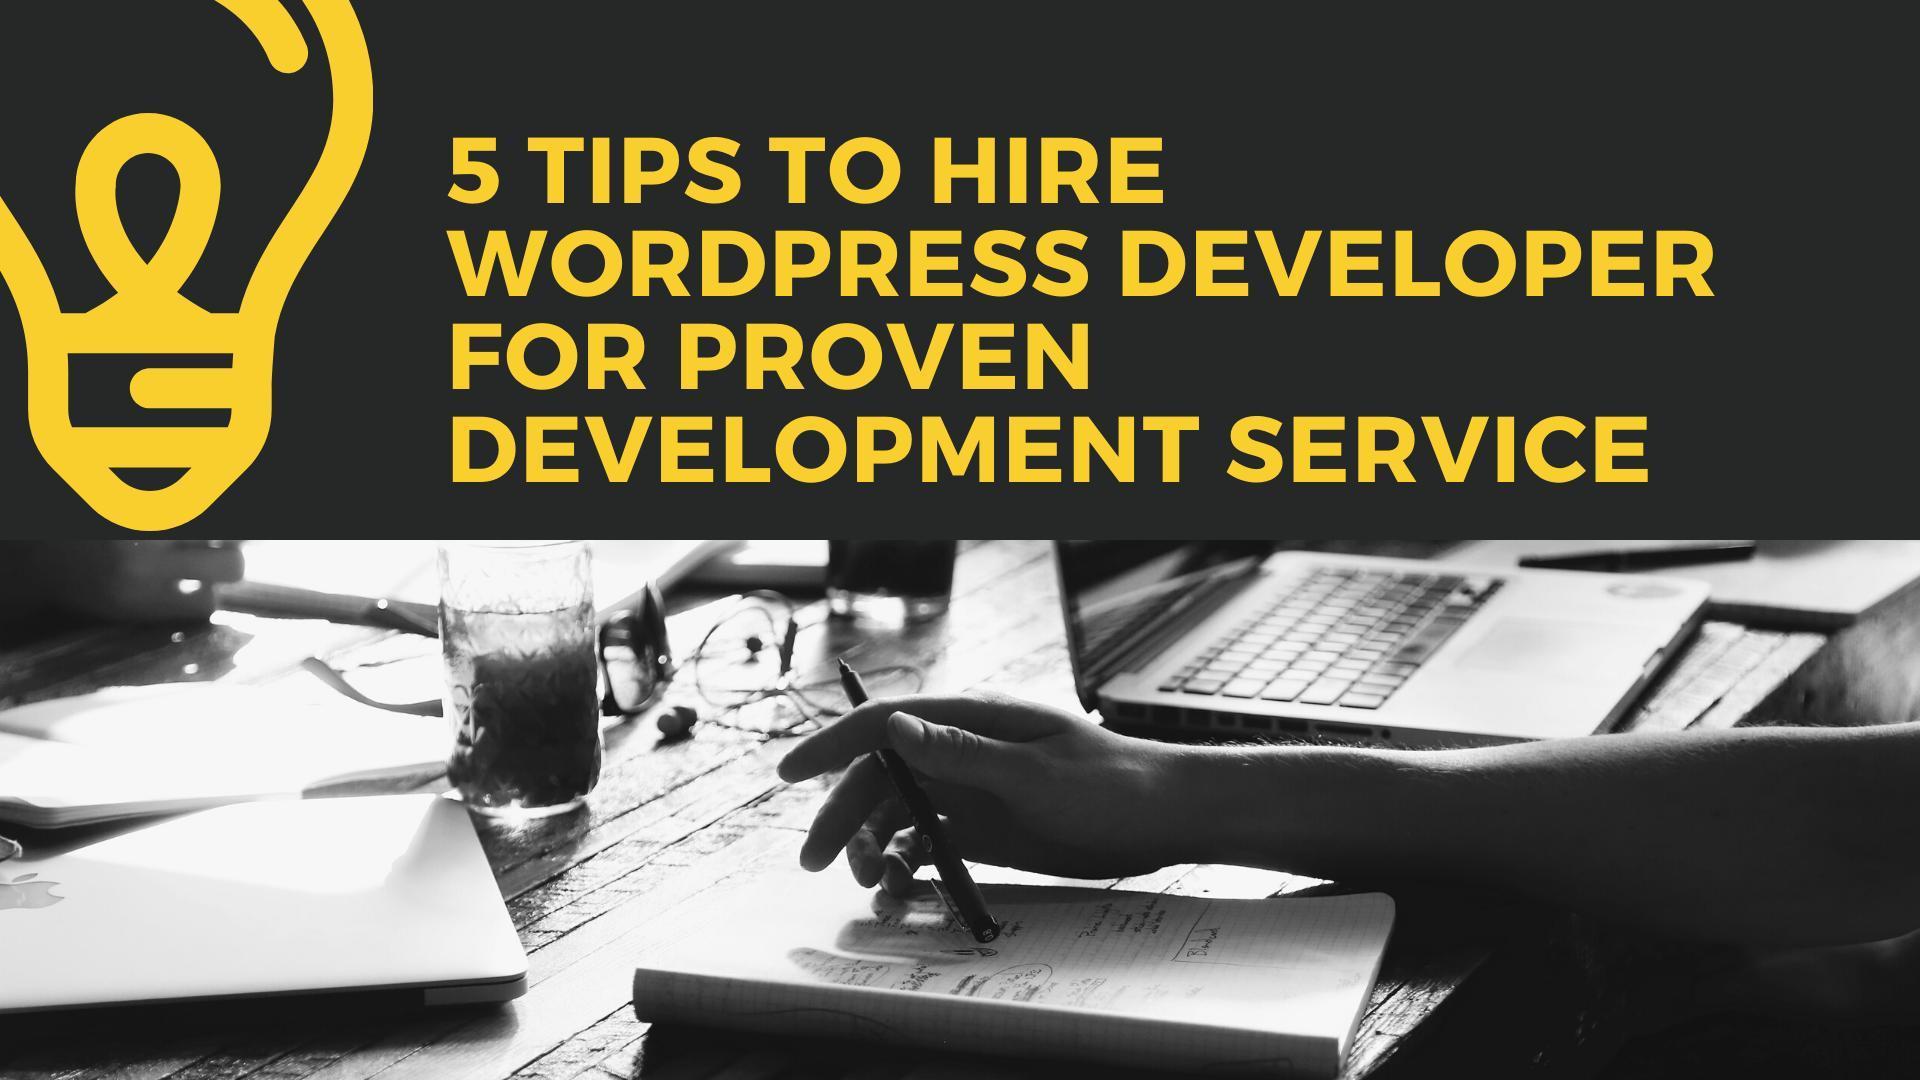 5 Tips to Hire WordPress Developer for Proven Development Service